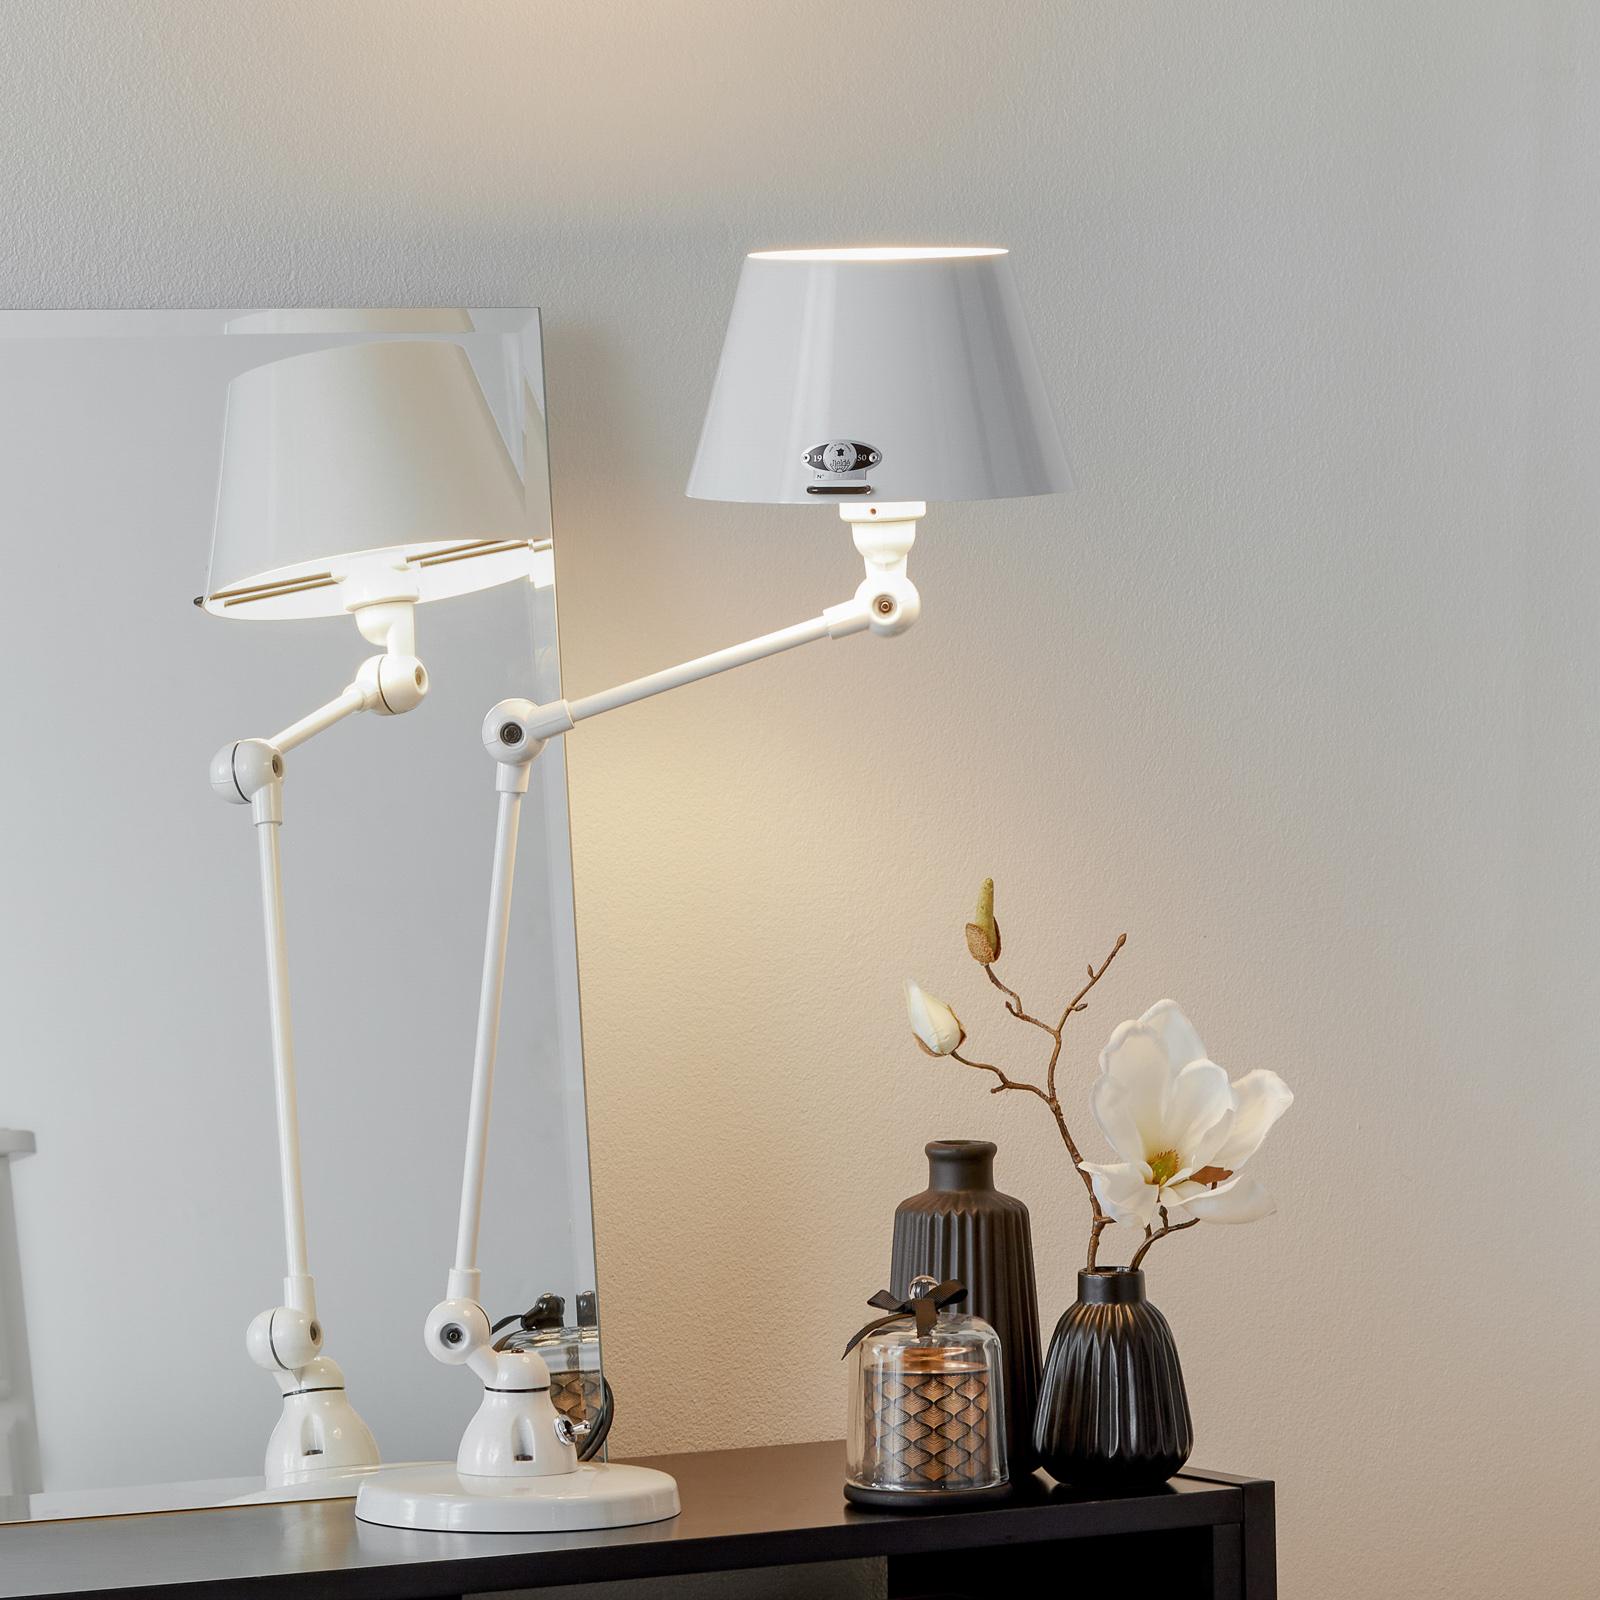 Jieldé Aicler AID373 tafellamp, wit